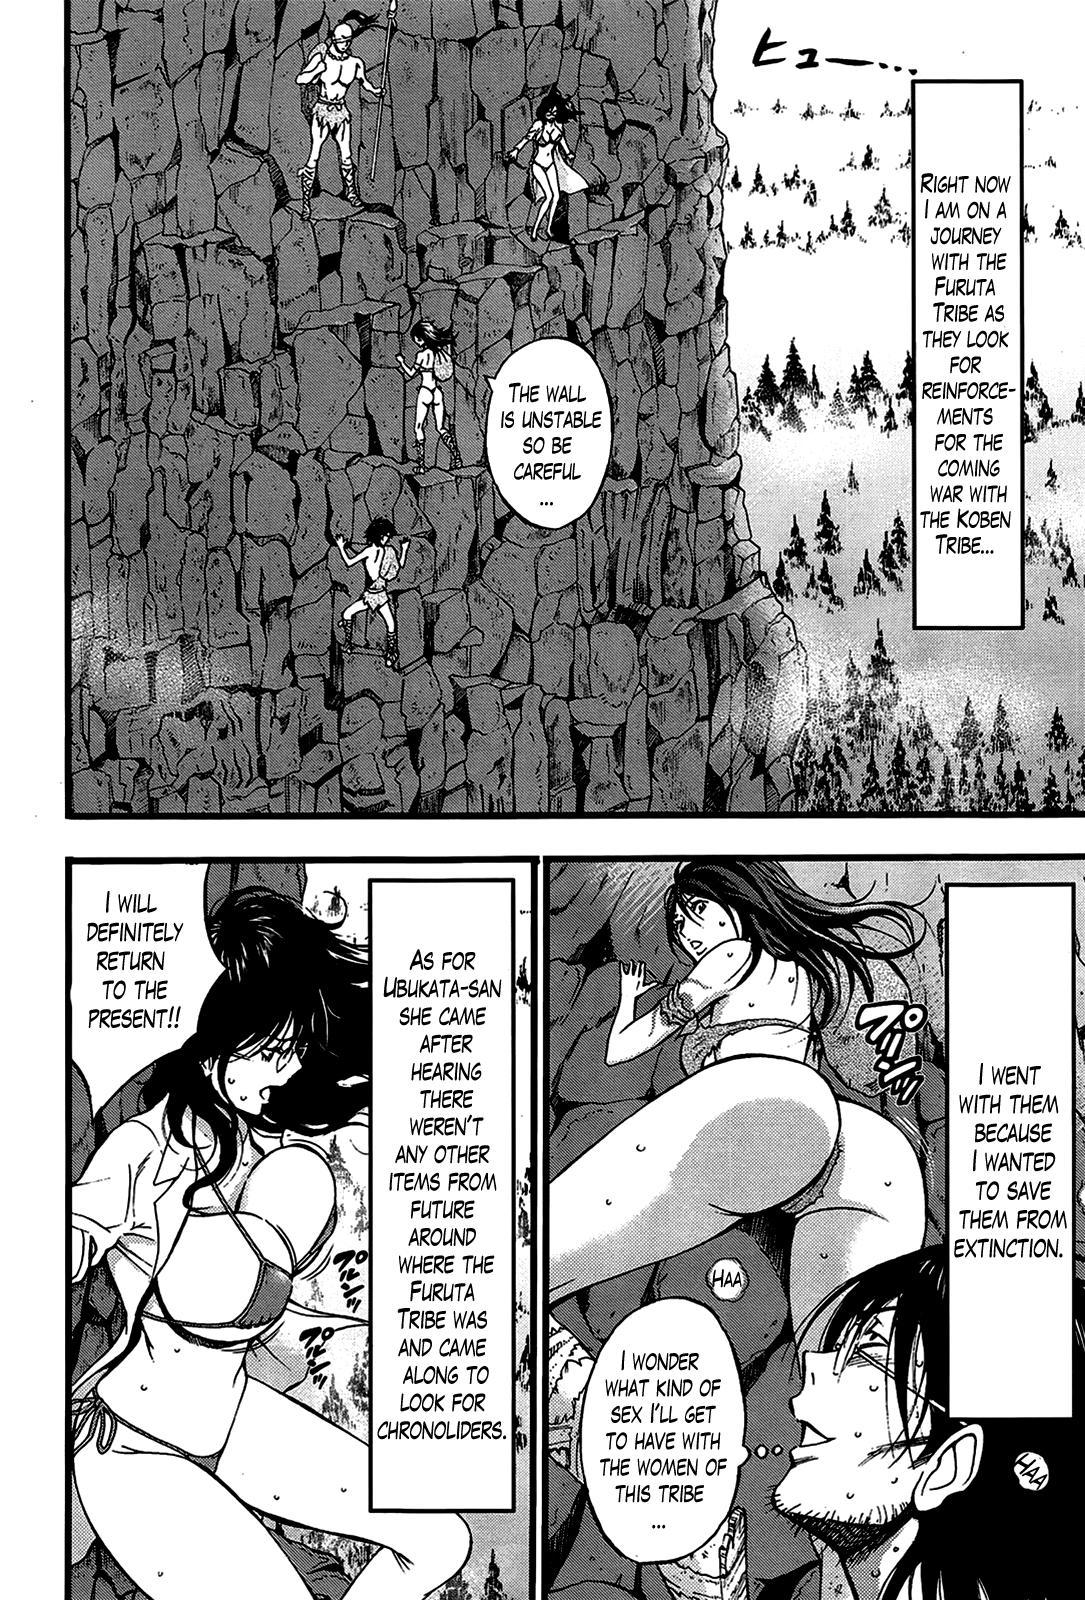 Kigenzen 10000 Nen no Ota | The Otaku in 10,000 B.C. 310